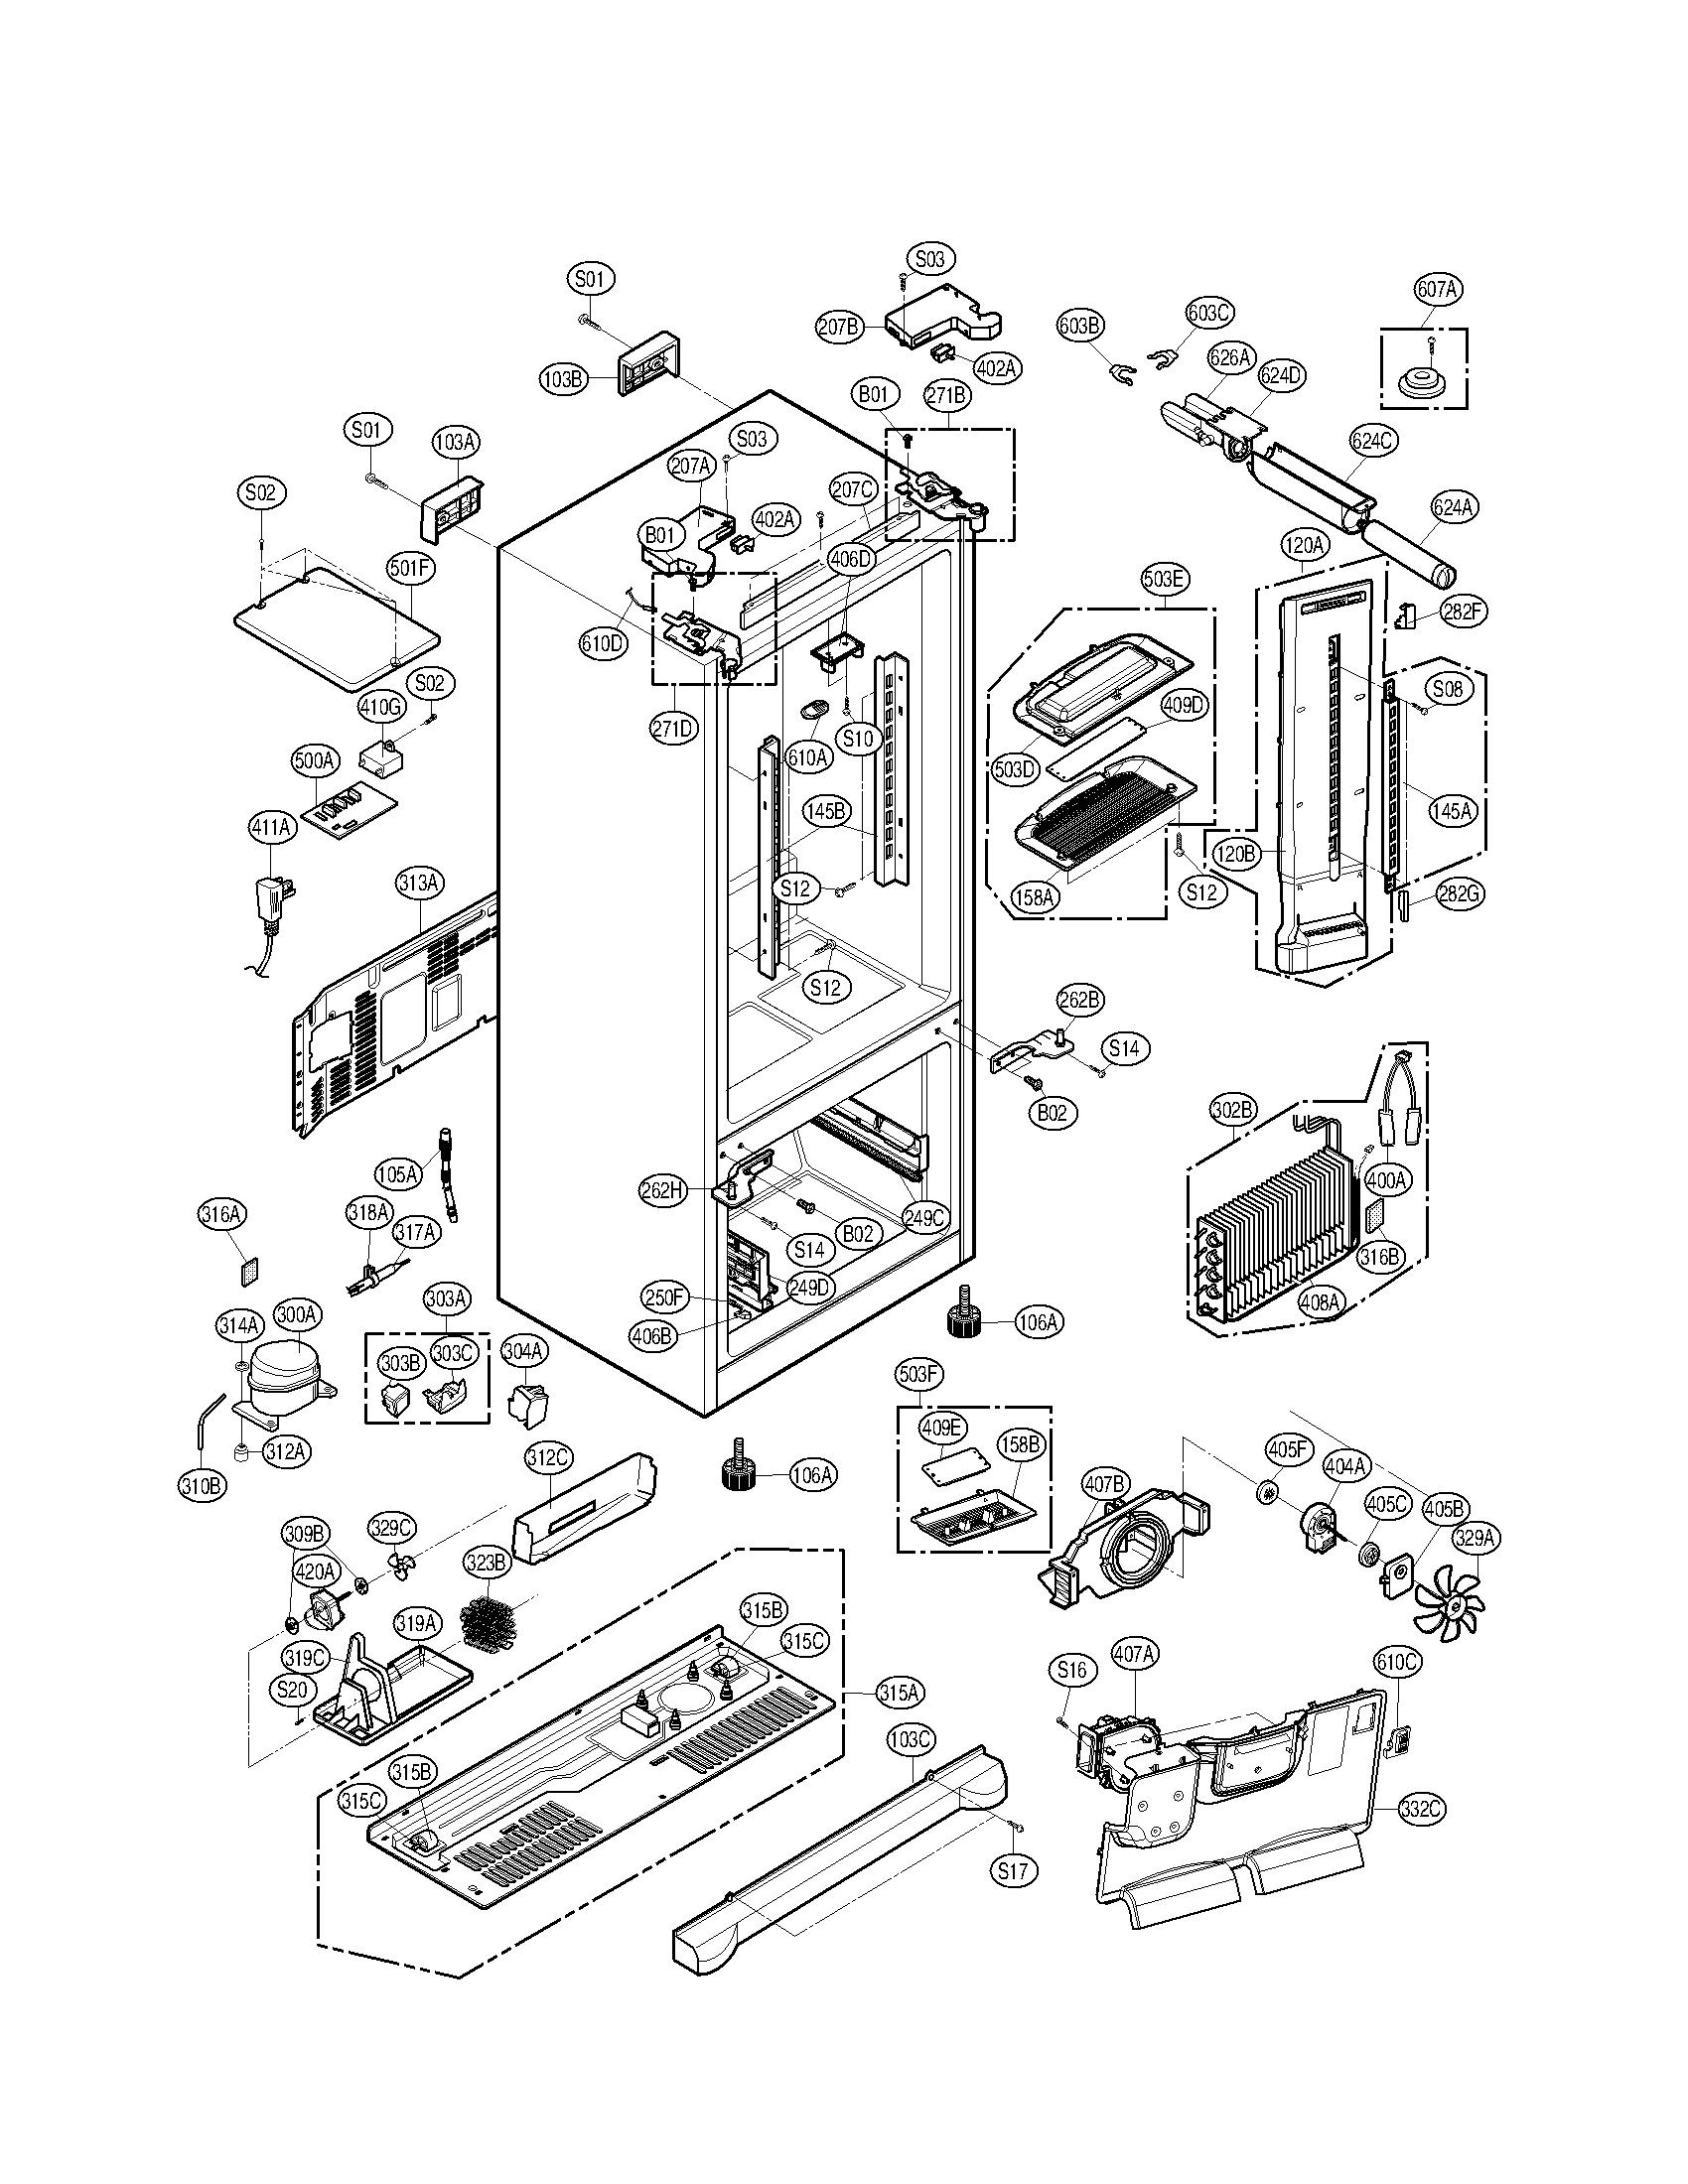 kenmore bottom freezer refrigerator model 795 manual